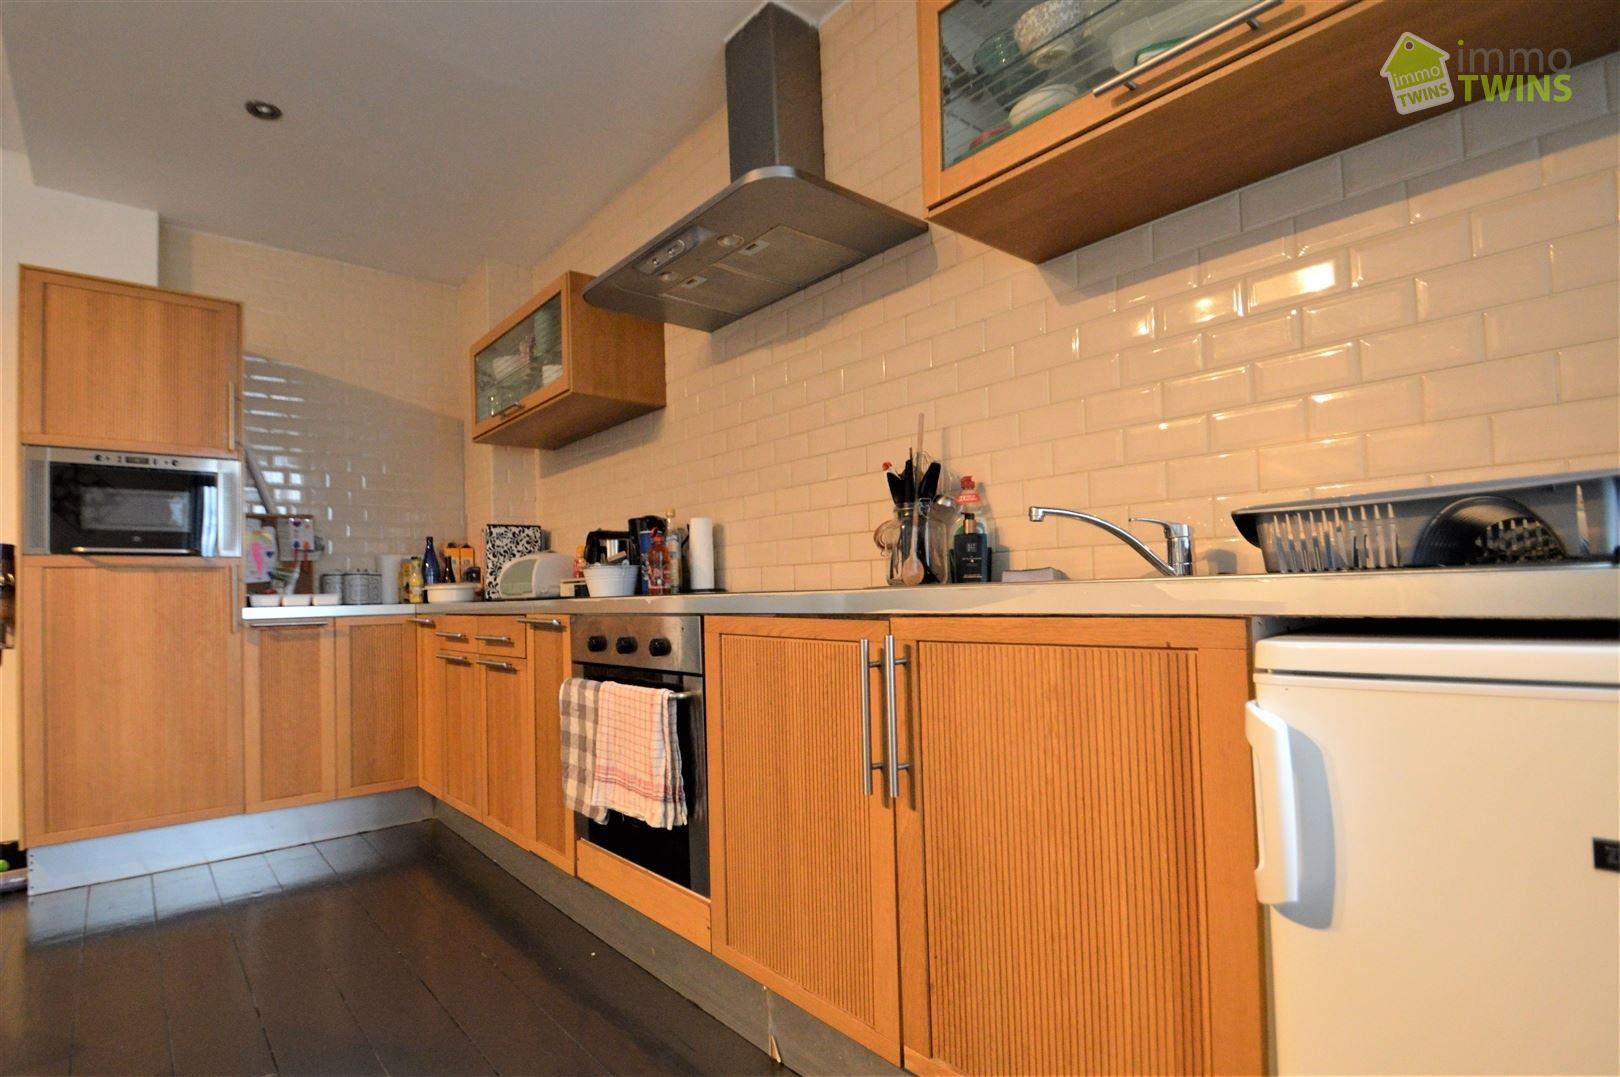 Foto 5 : Duplex/triplex te 9200 DENDERMONDE (België) - Prijs € 650